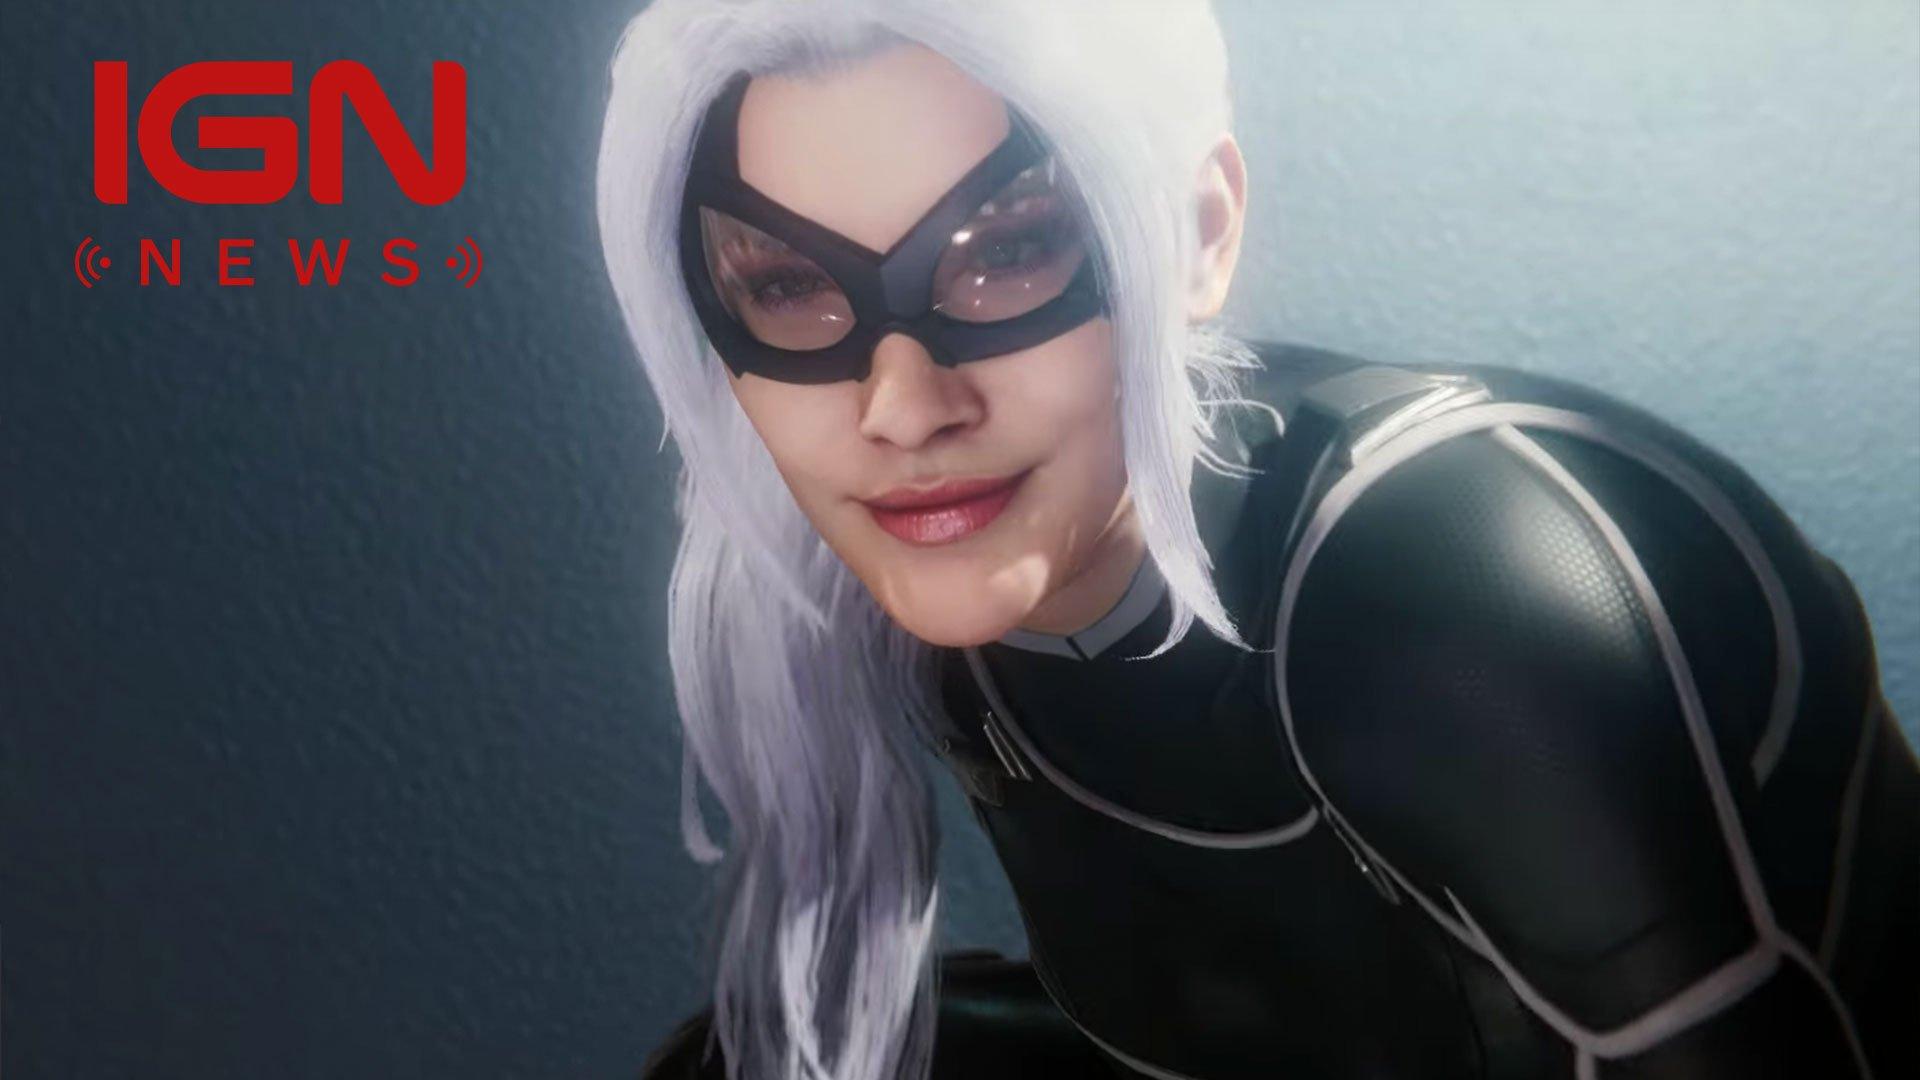 Marvels Spider Man First DLC Pack Out Next Week   IGN News 1920x1080